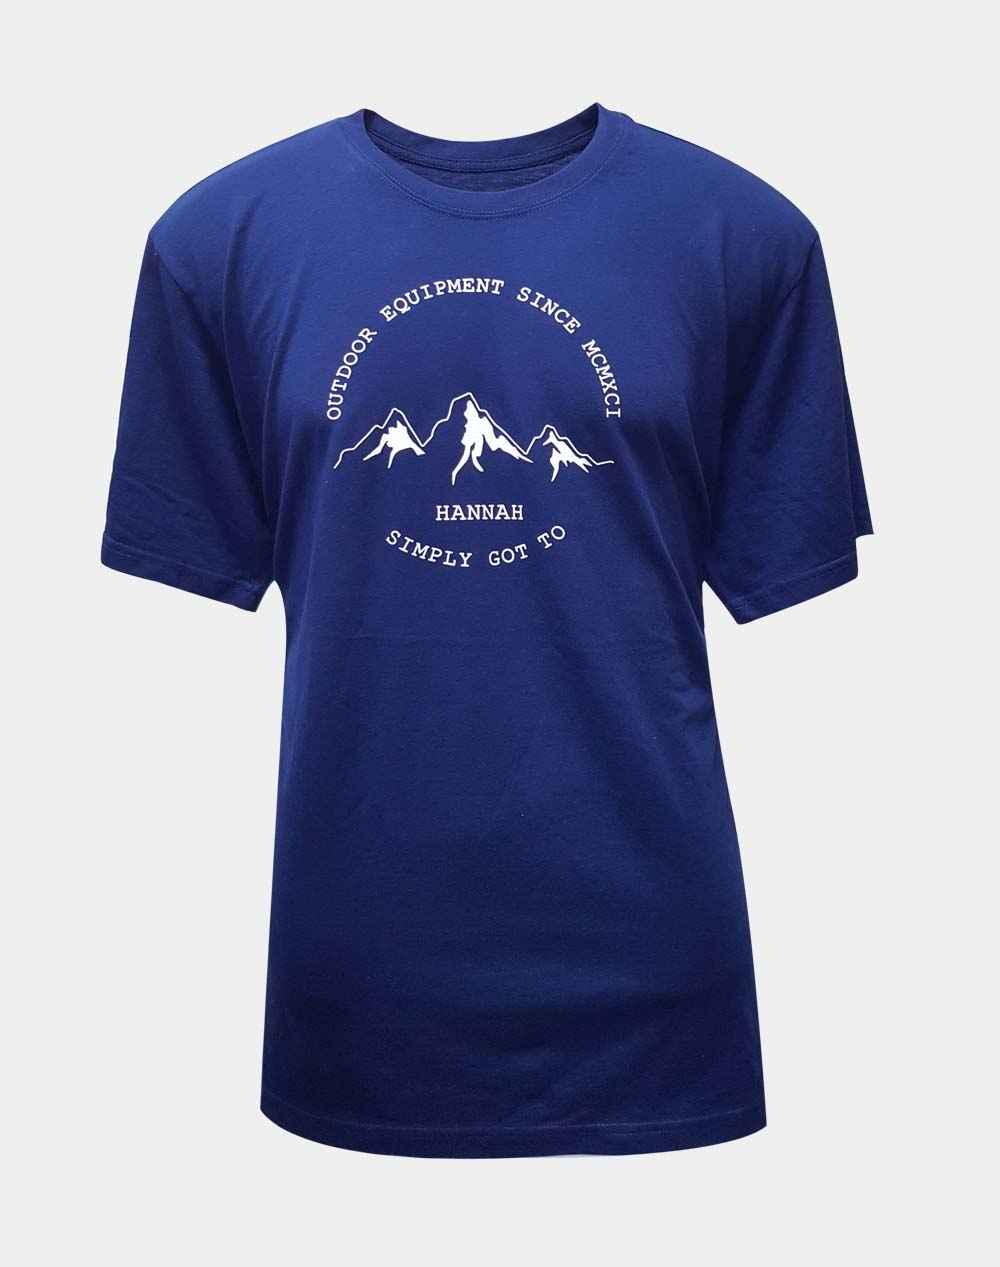 Custom Print T-shirt Manufacturer, Wholesale Custom Print T-shirt Supplier, Bangladesh, Manufacturer, Supplier, Exporter